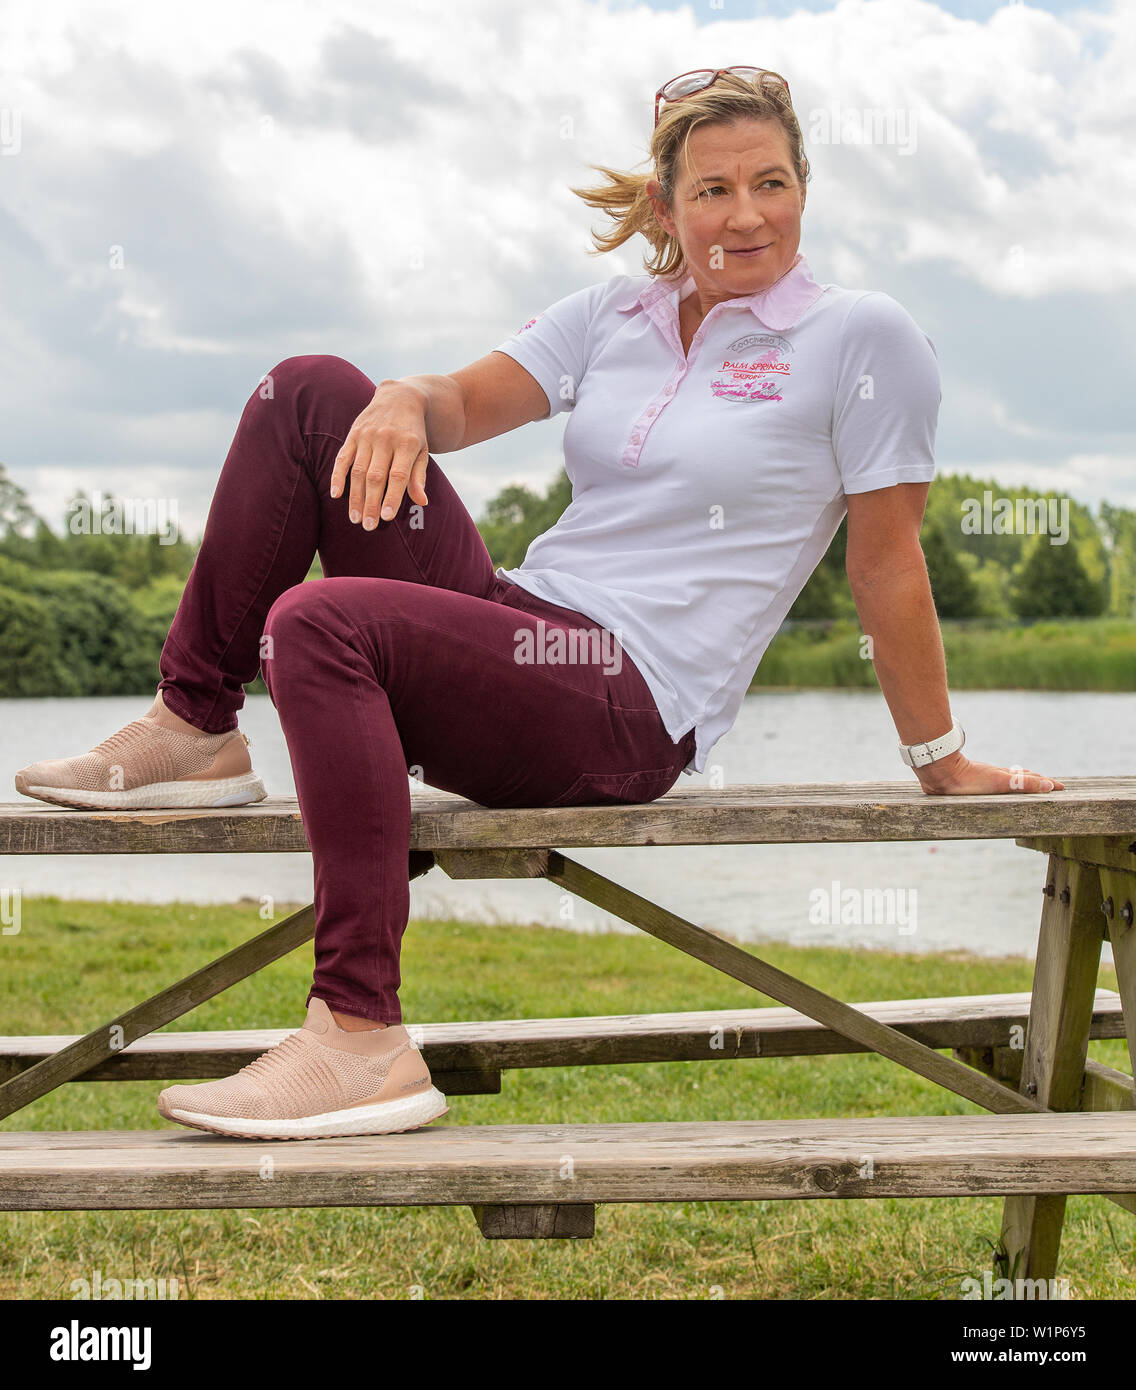 29 june 2019 Heerenveen, The Netherlands Speedskating Training on Summerice  Claudia Pechstein Stock Photo